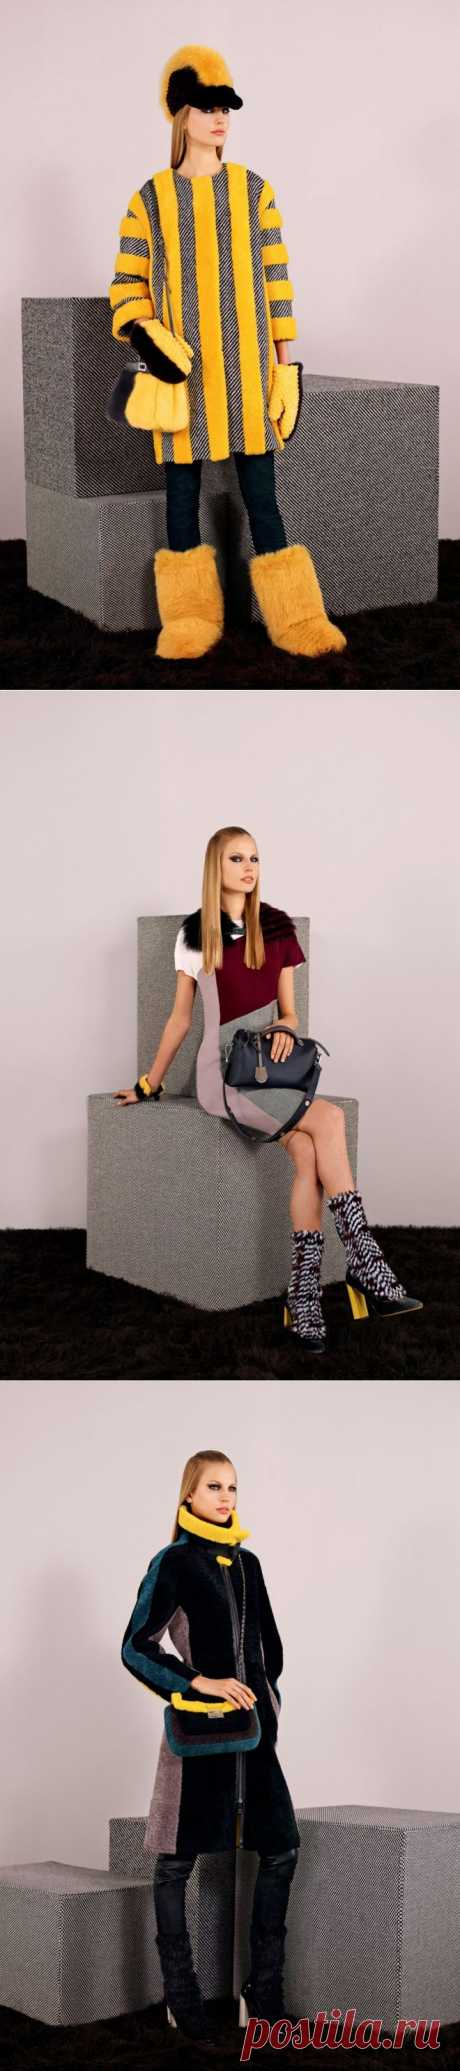 Меховые фантазии от модного дома Fendi и Карла Лагерфельда в коллекции pre-fall Fendi 2014